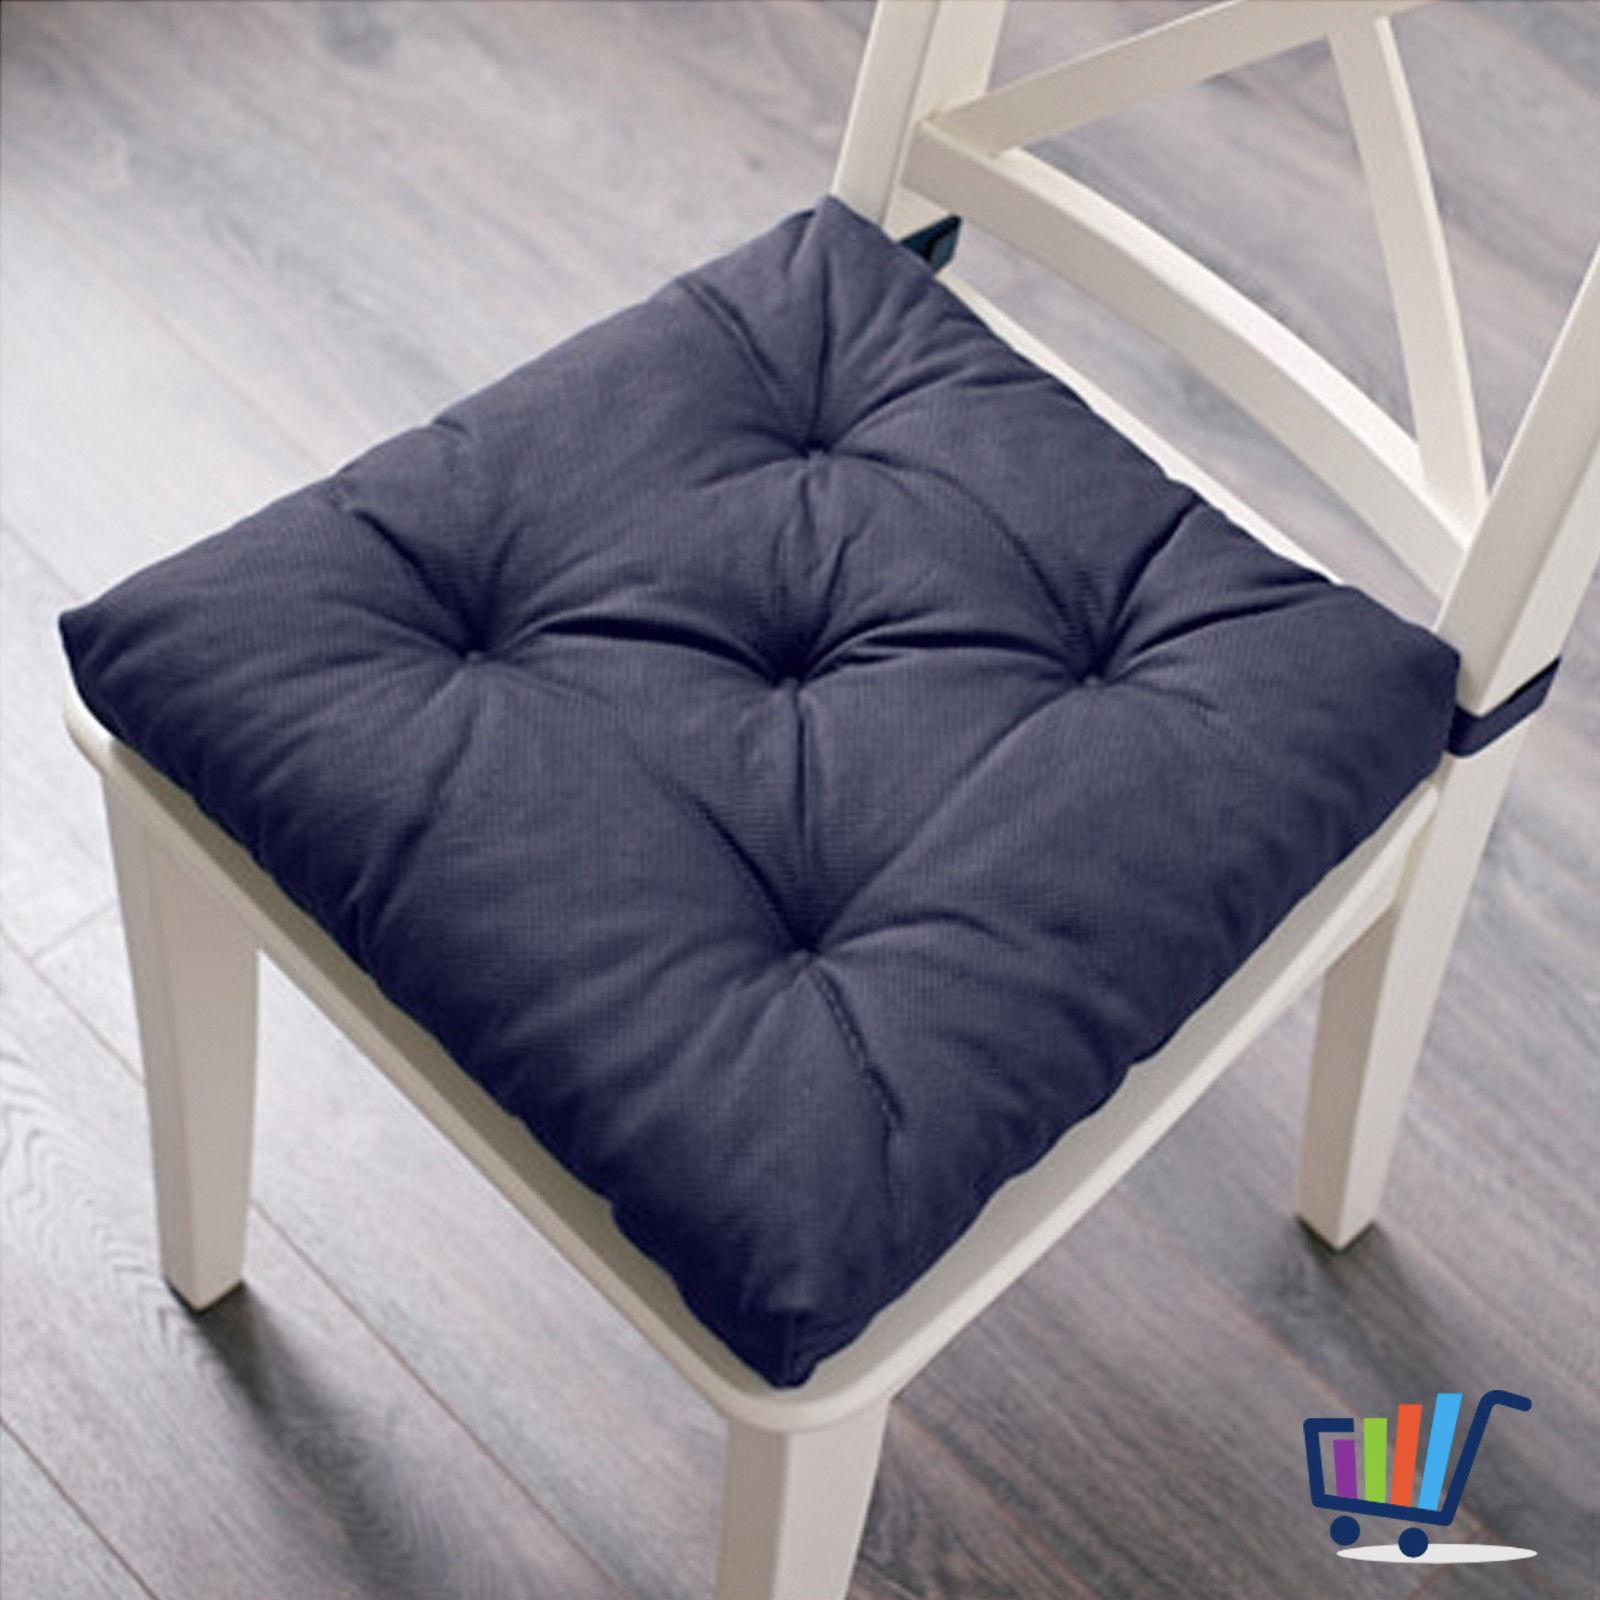 IKEA MALINDA Stuhlkissen Sitzkissen Polsterkissen Kissen blau ca. 40 ...